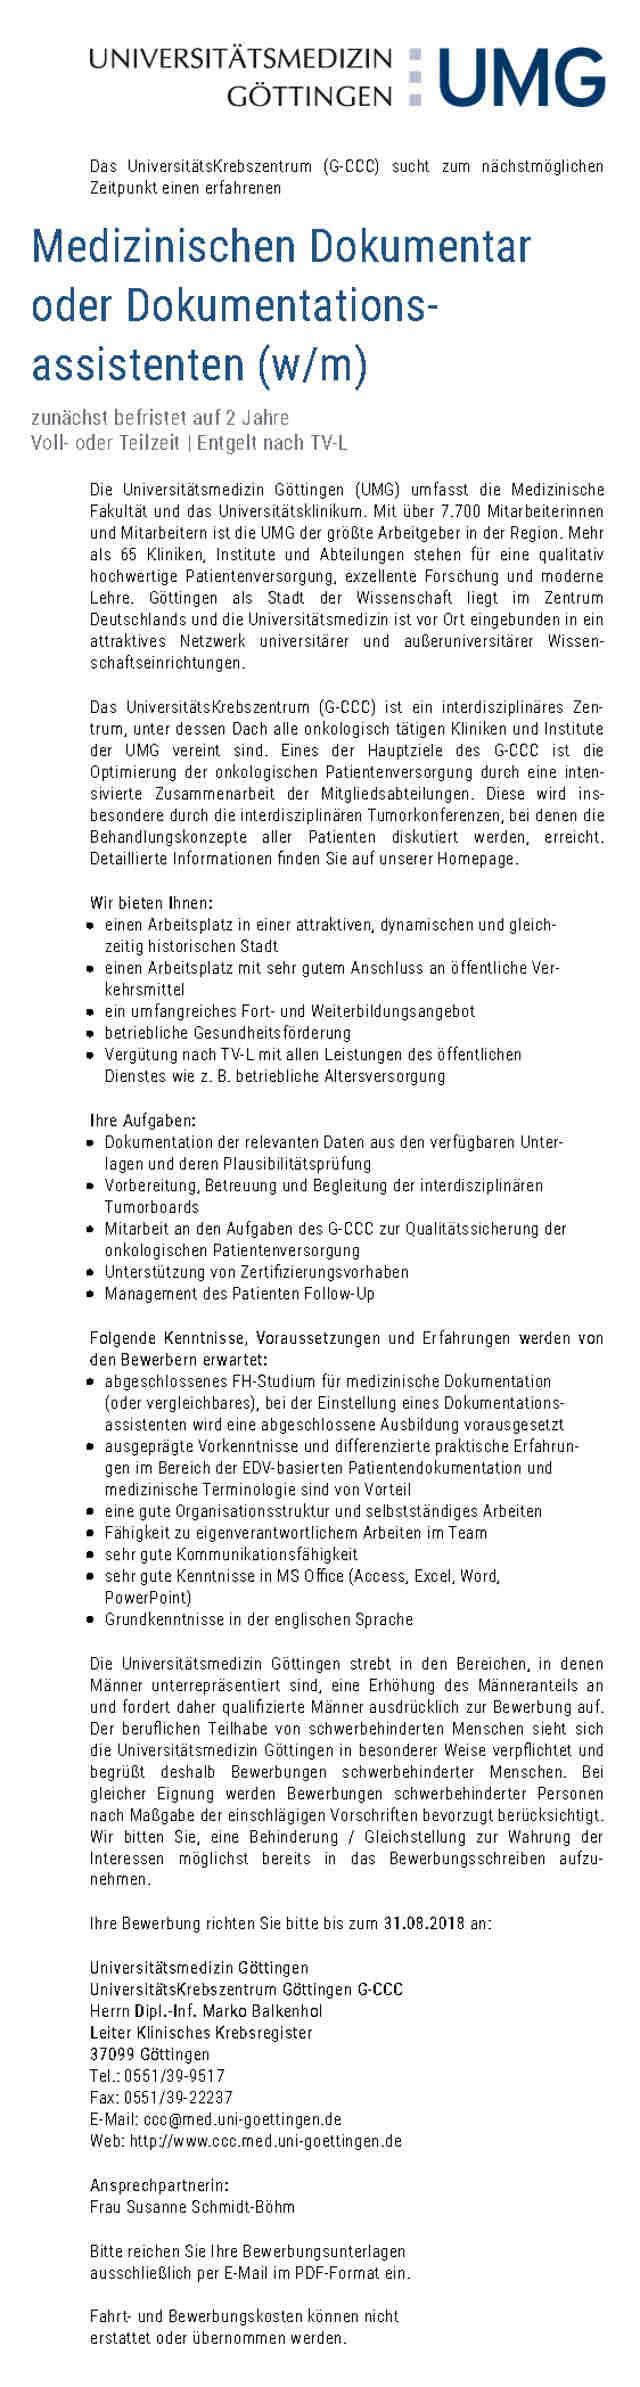 Universitätsmedizin Göttingen: Medizinischer Dokumentar / Dokumentationsassistent (w/m)